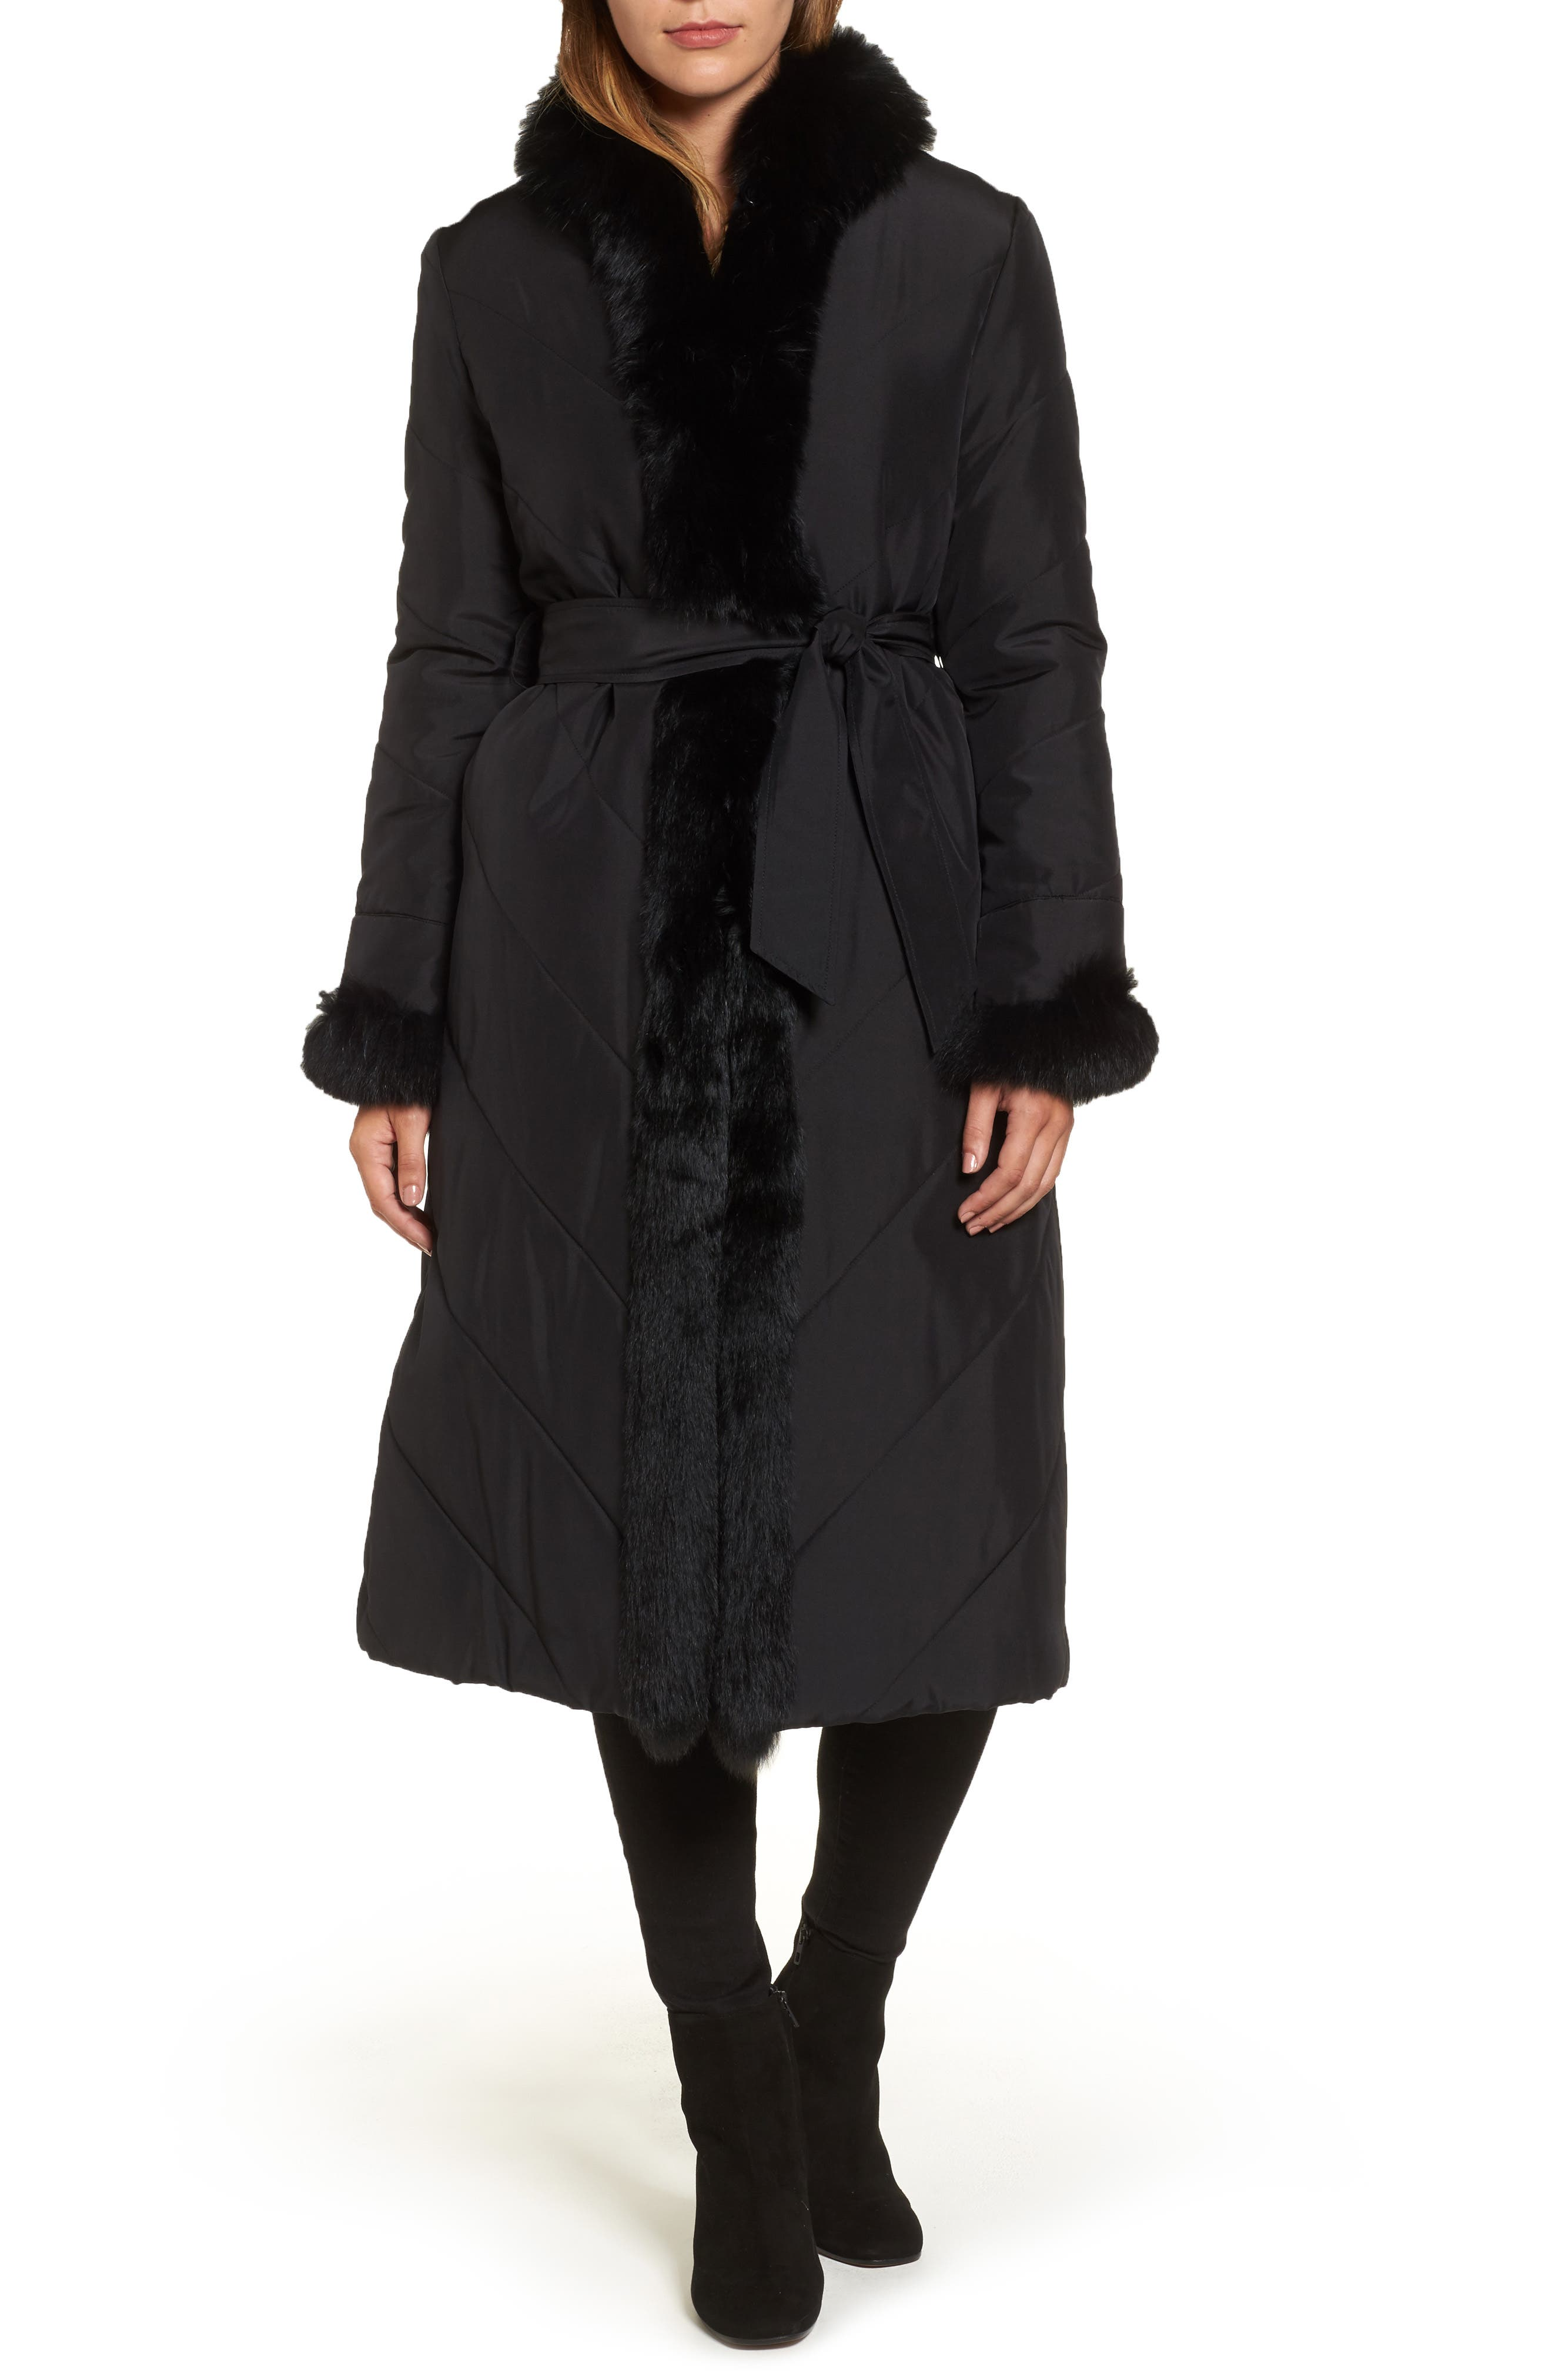 George Simonton Couture Packable Silk Coat with Genuine Fox Fur & Genuine Rabbit Fur